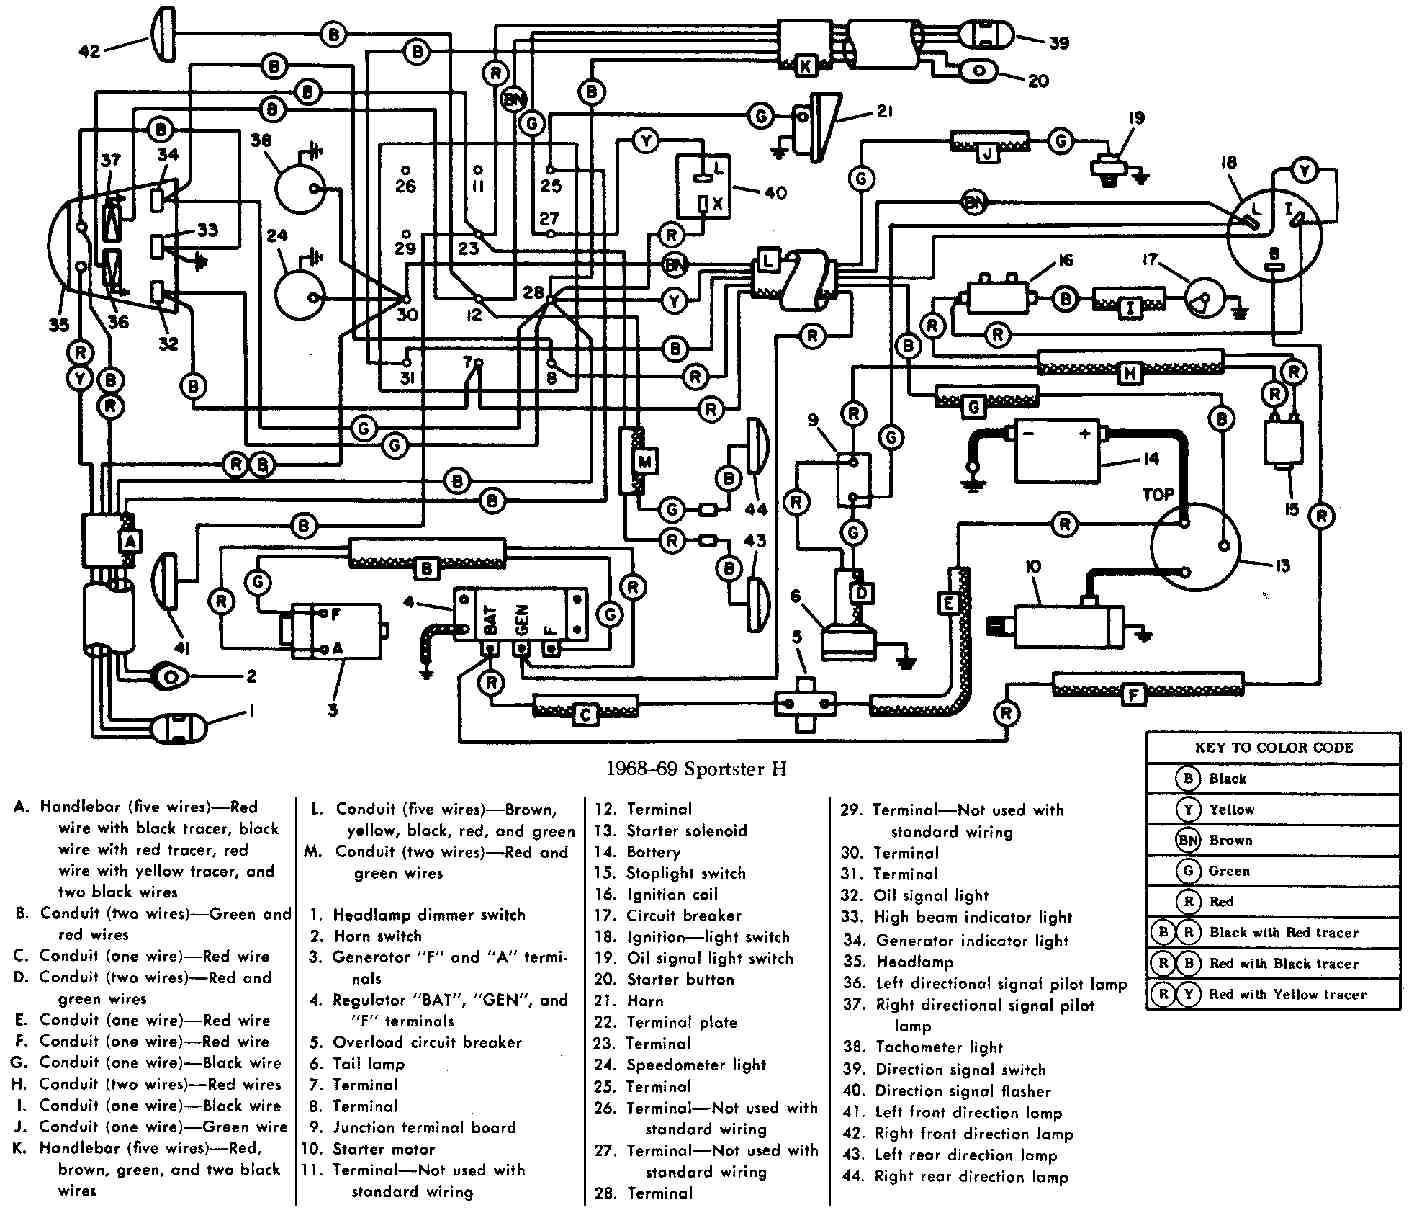 medium resolution of 1973 flh wiring diagram dash wiring diagram autovehiclewiring diagrams online 6503 harley davidson forums wiring diagram